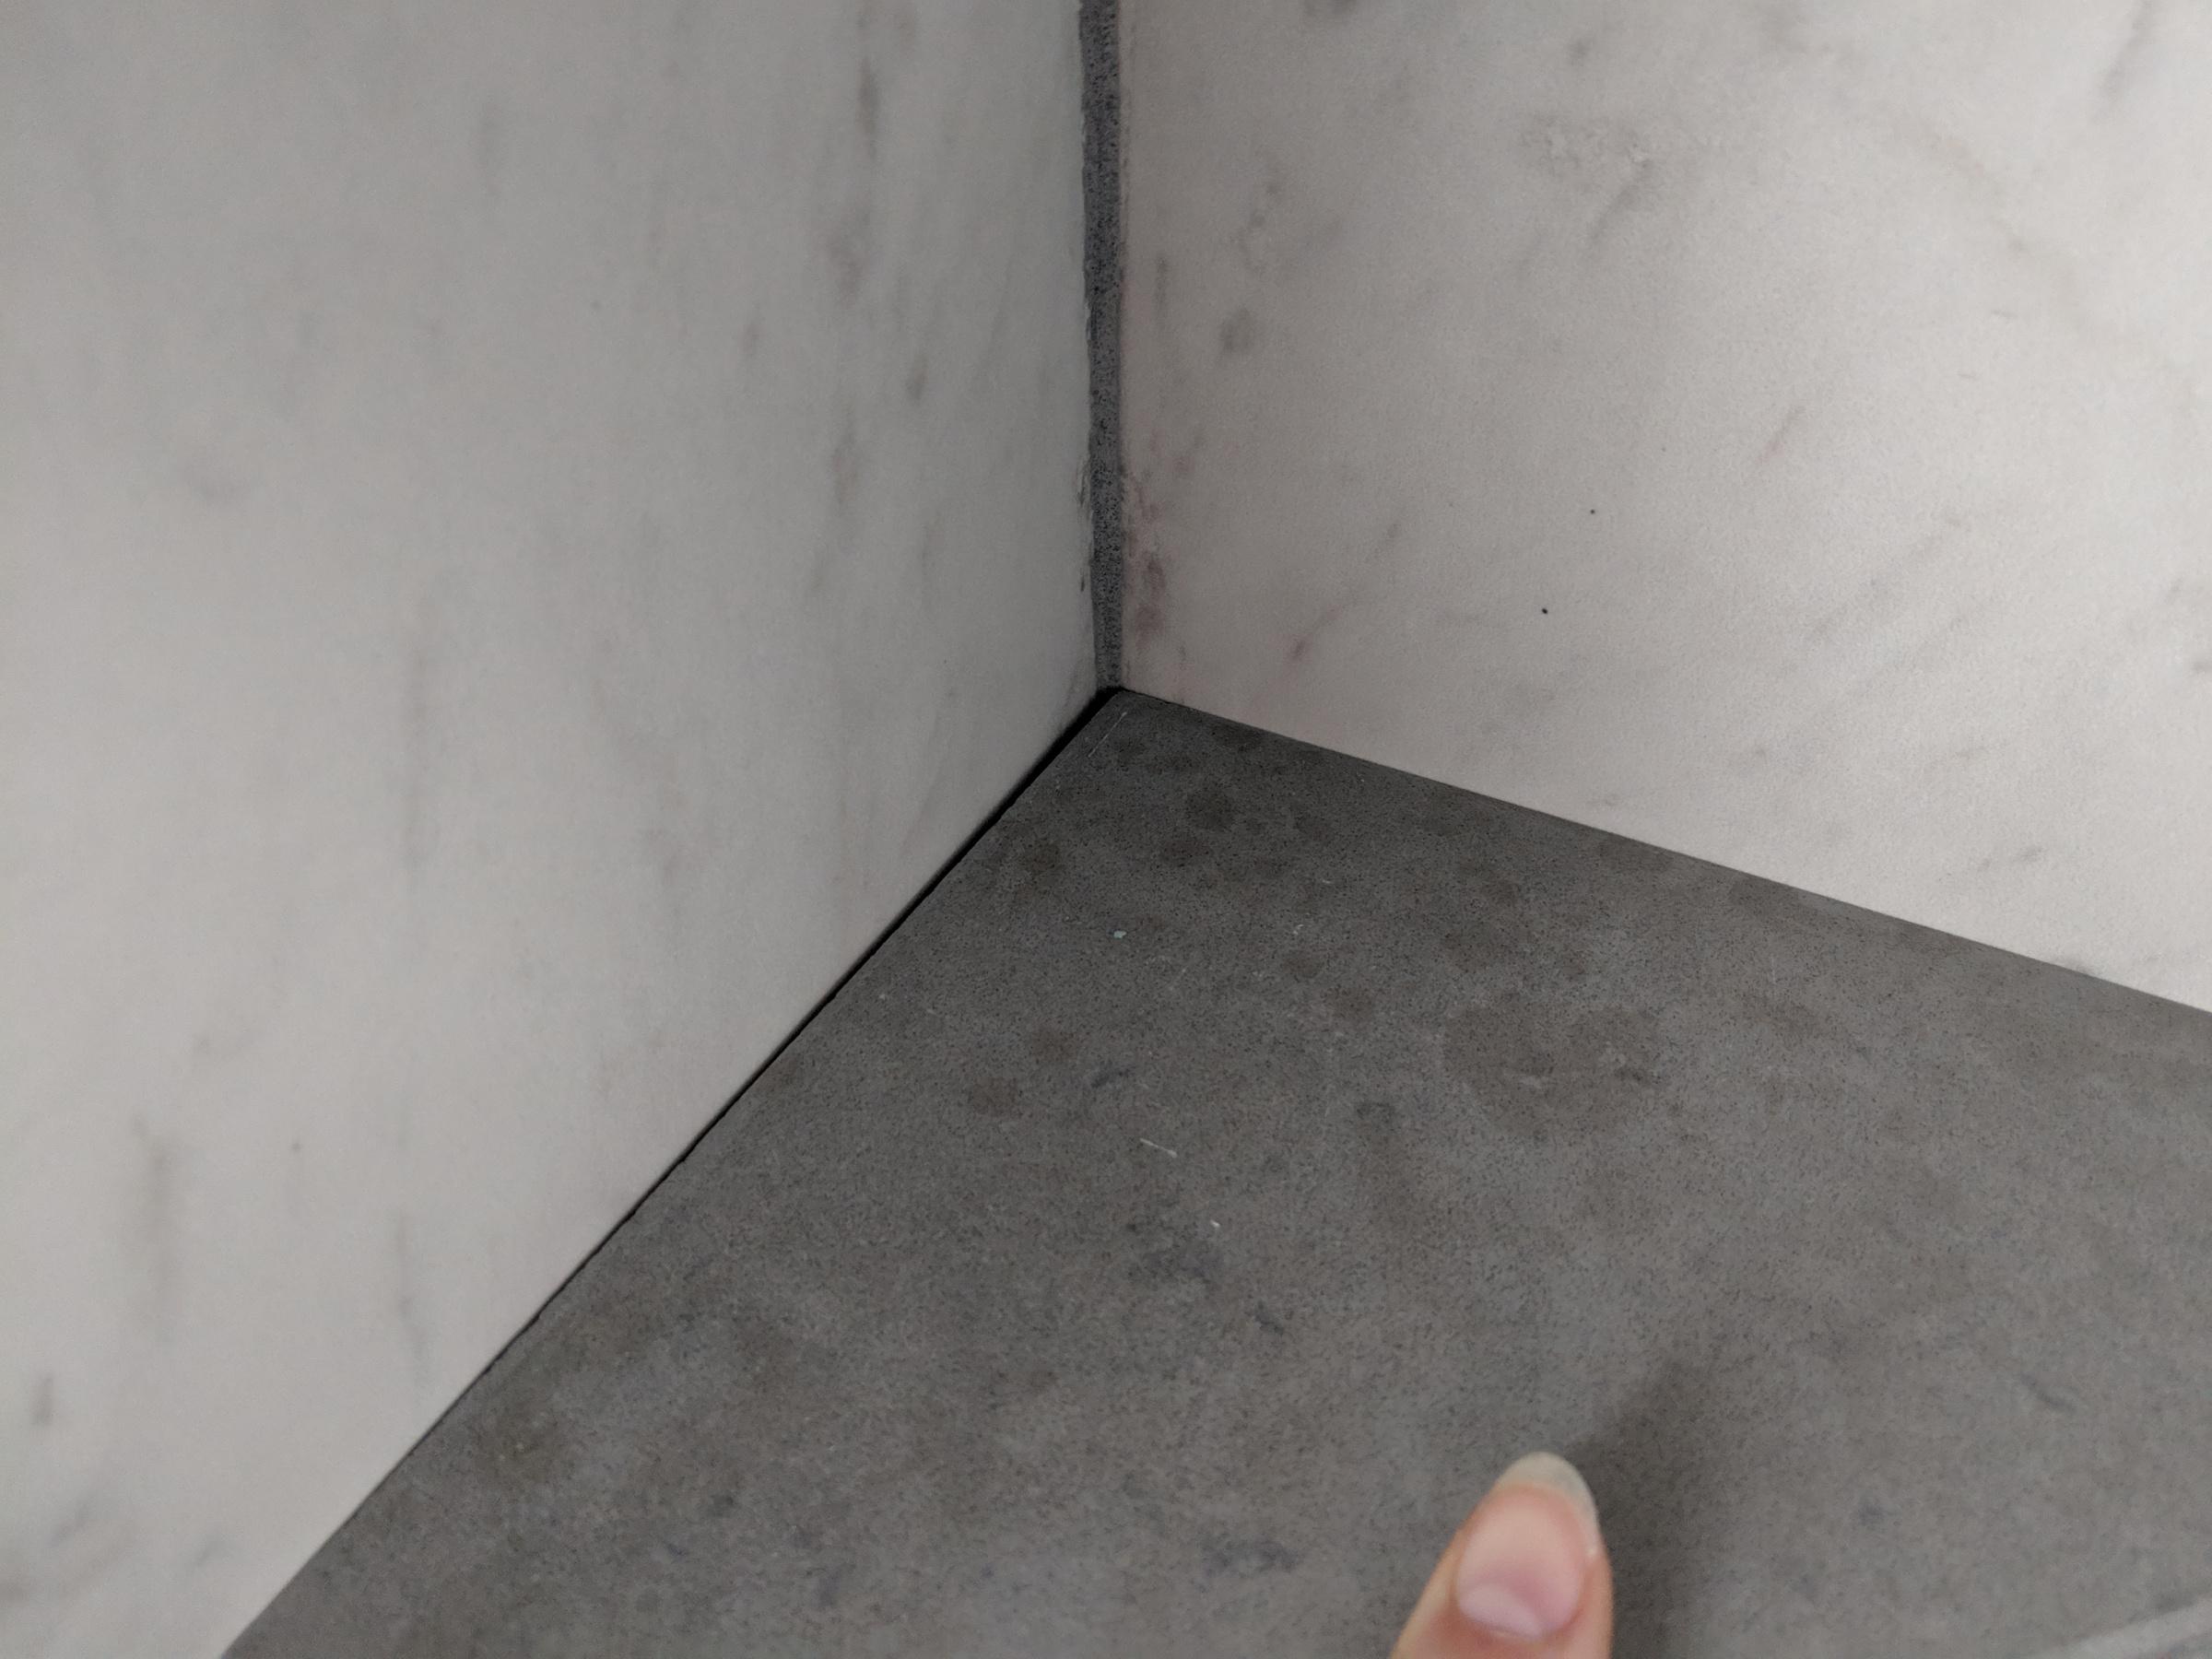 retrofit shower corner shelf-img_20190507_134301_1.jpg